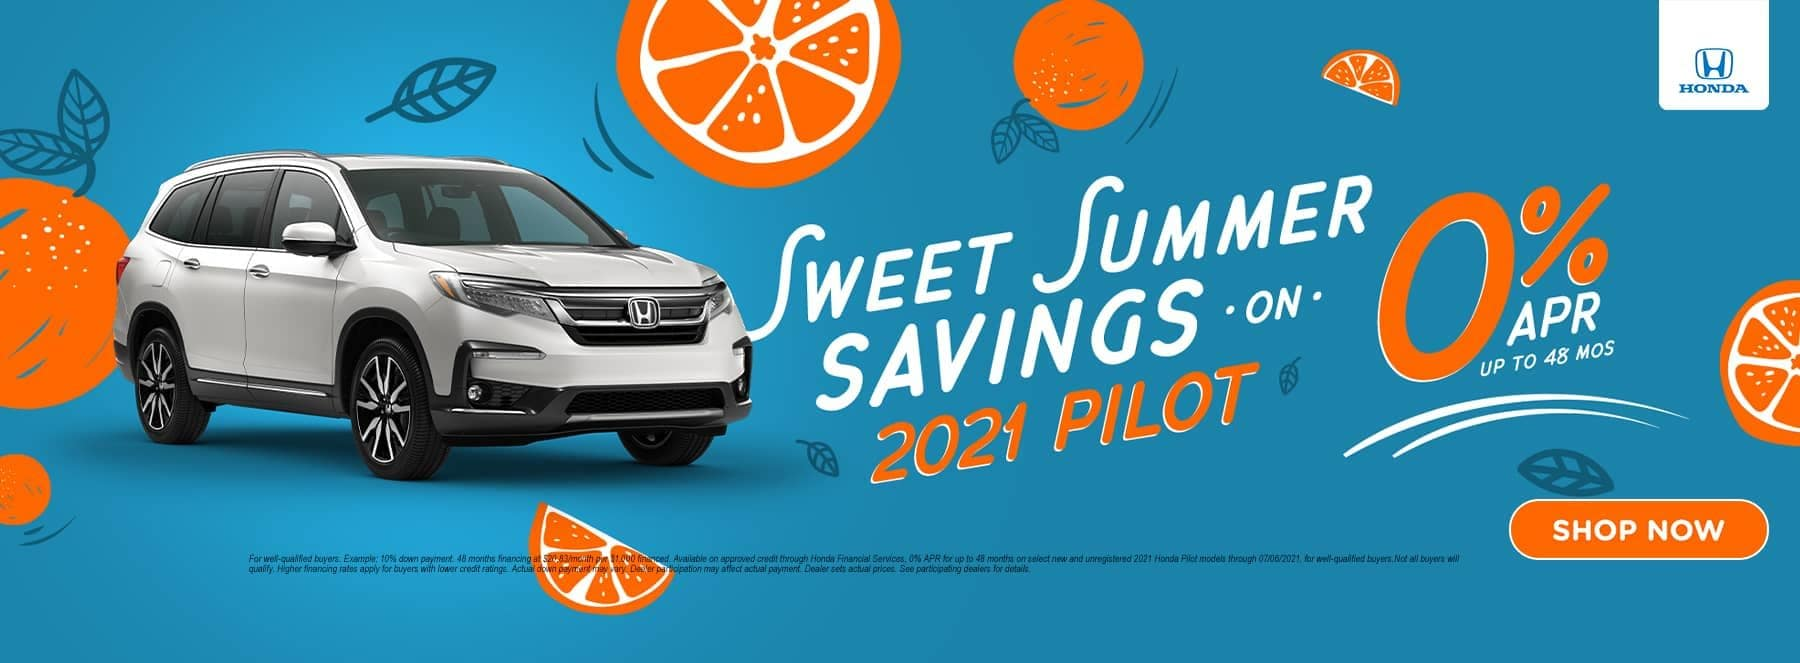 Sweet Summer Savings 2021 Pilot